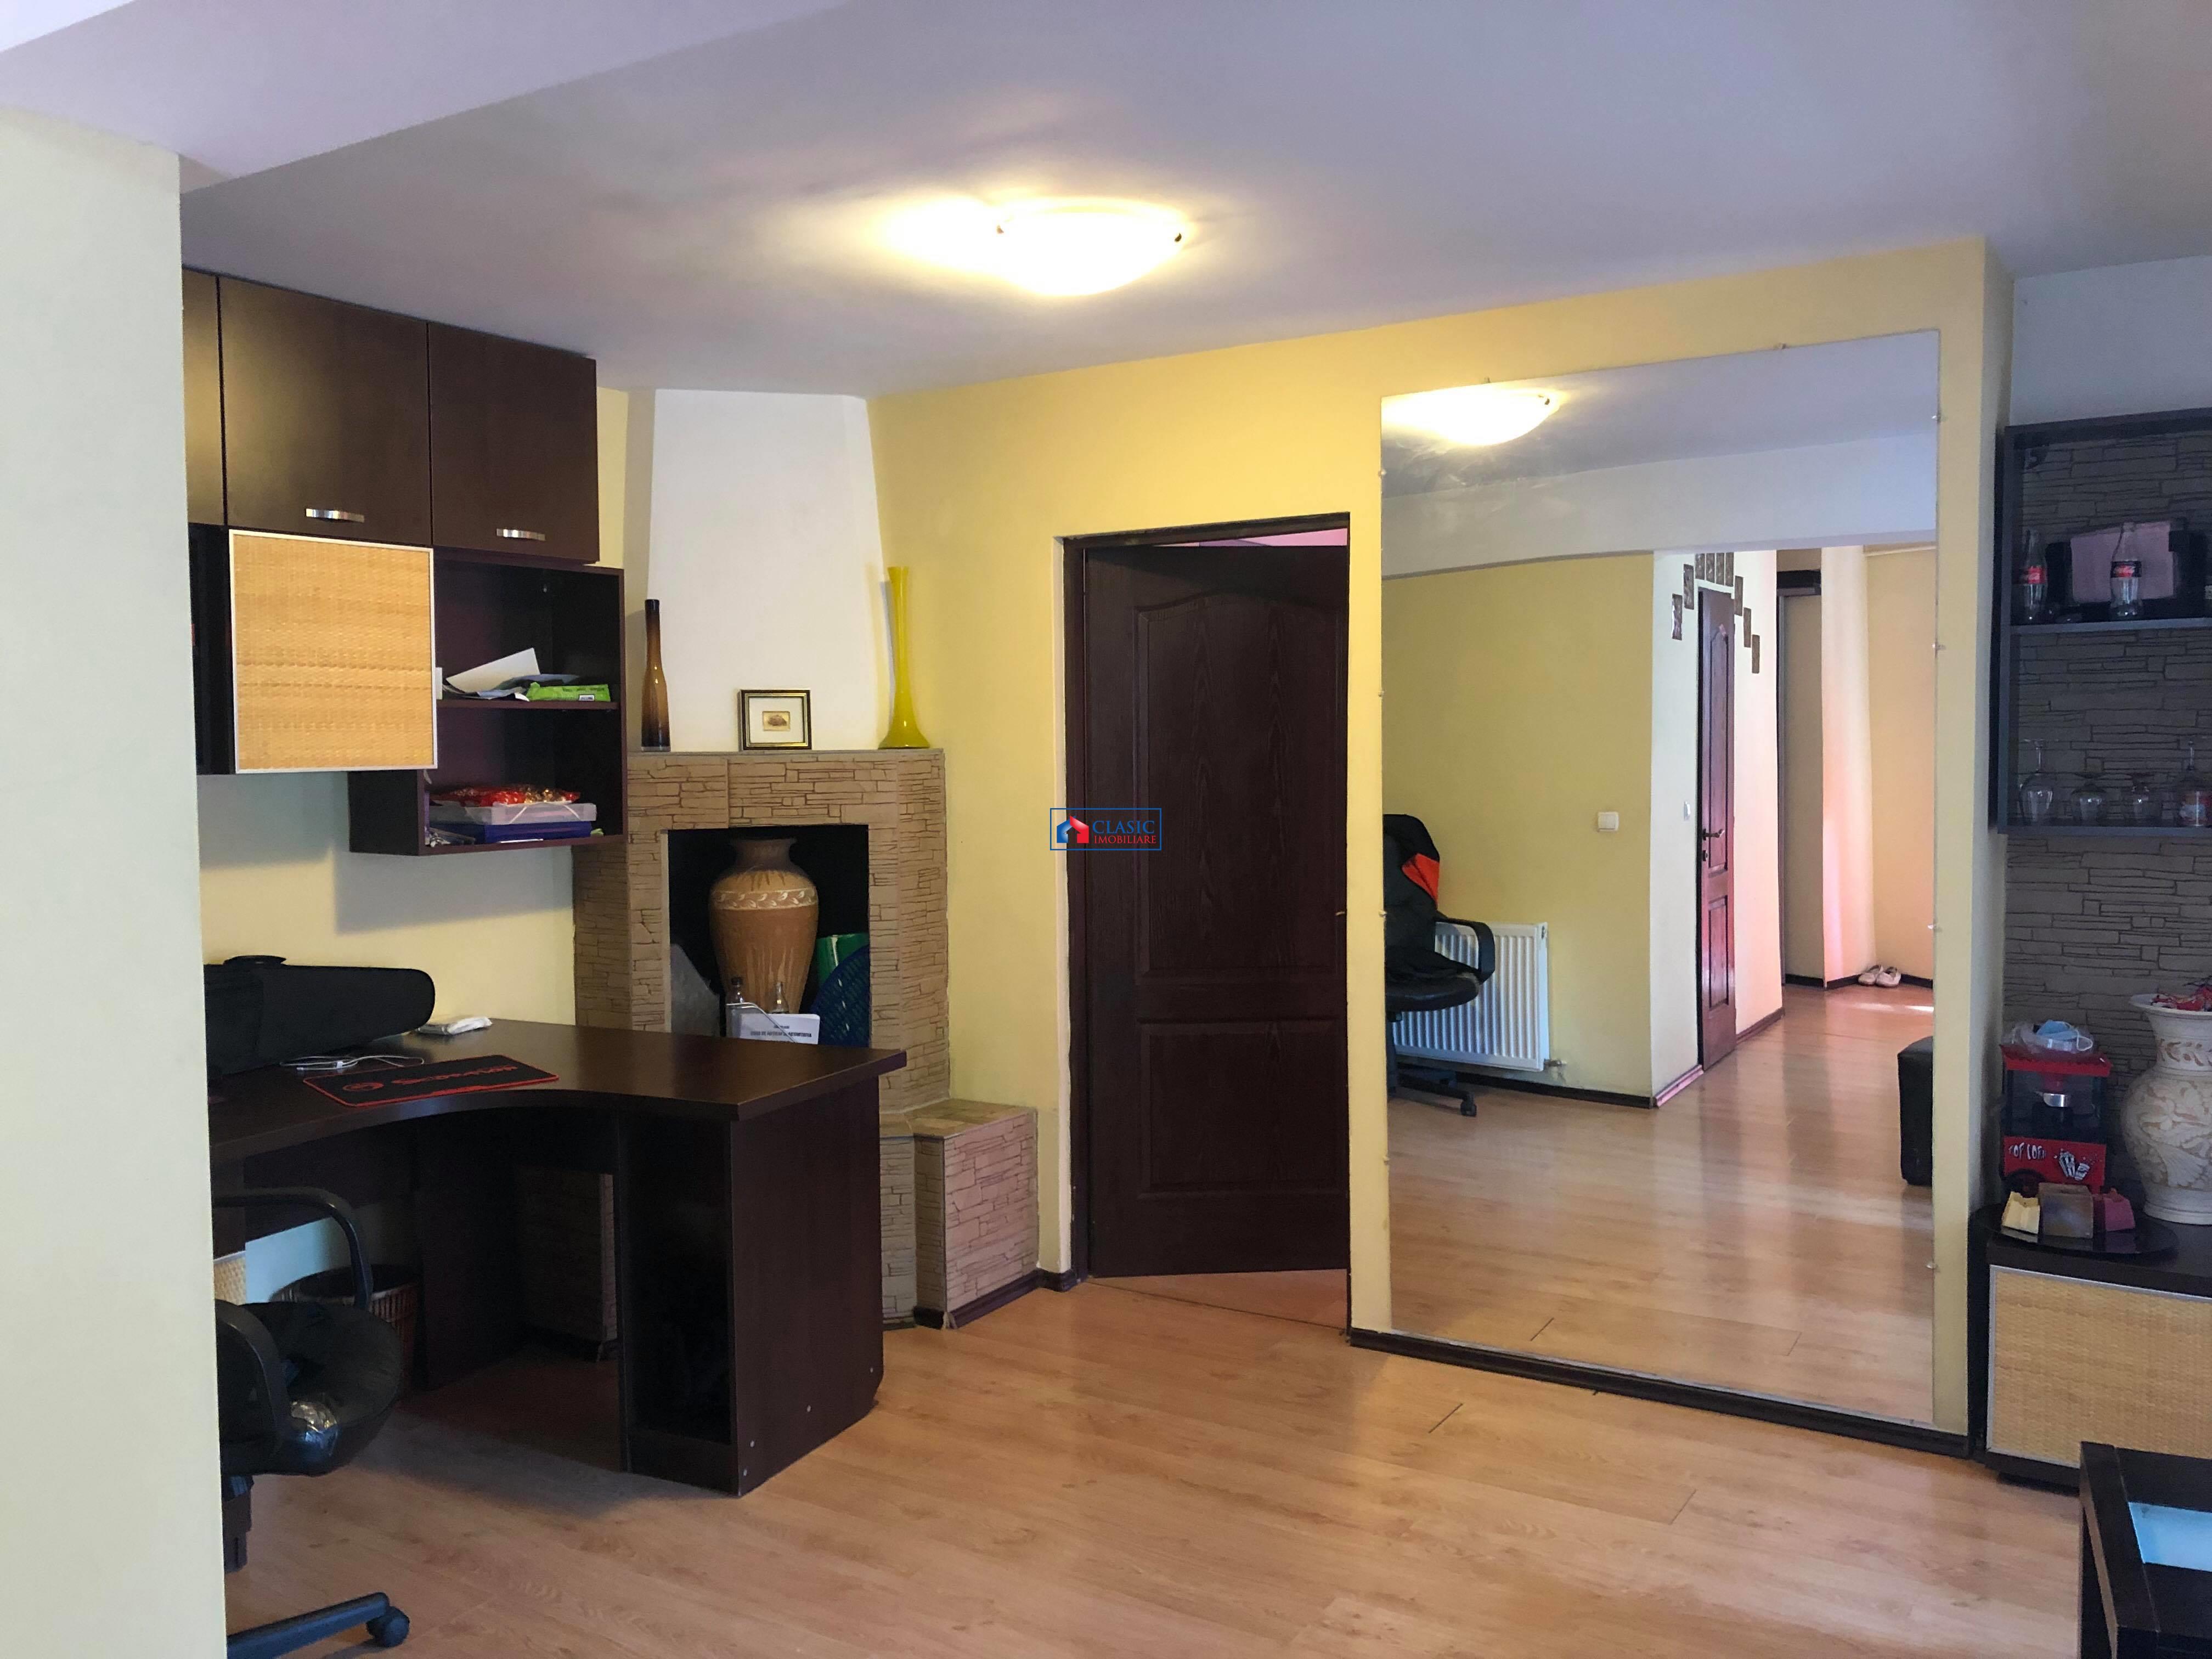 Vanzare apartament 2 camere bloc nou in Zorilor M. Eliade